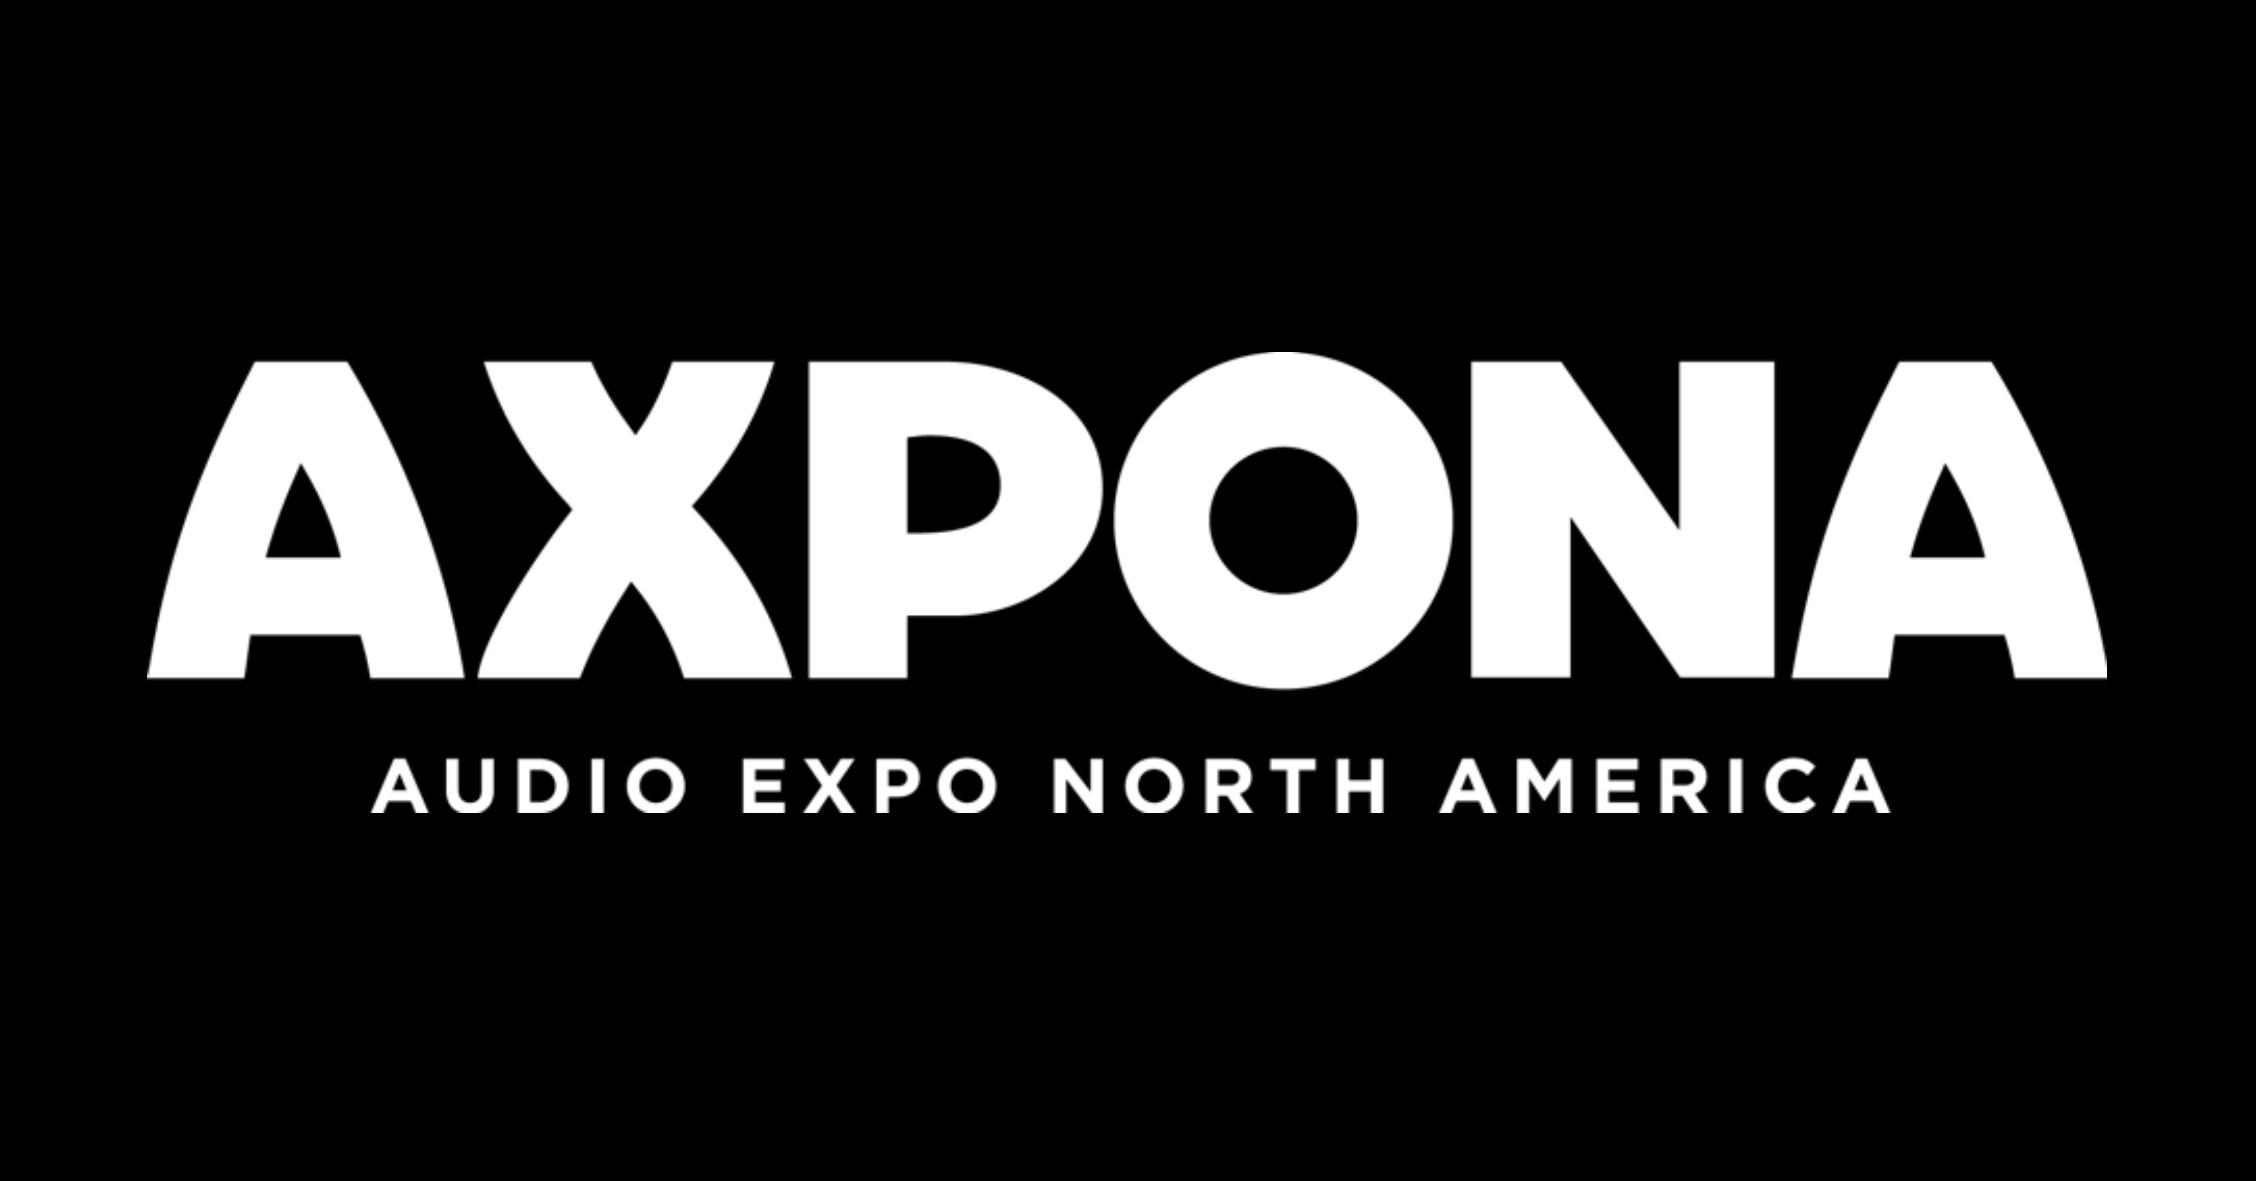 Axpona Audio Expo North America